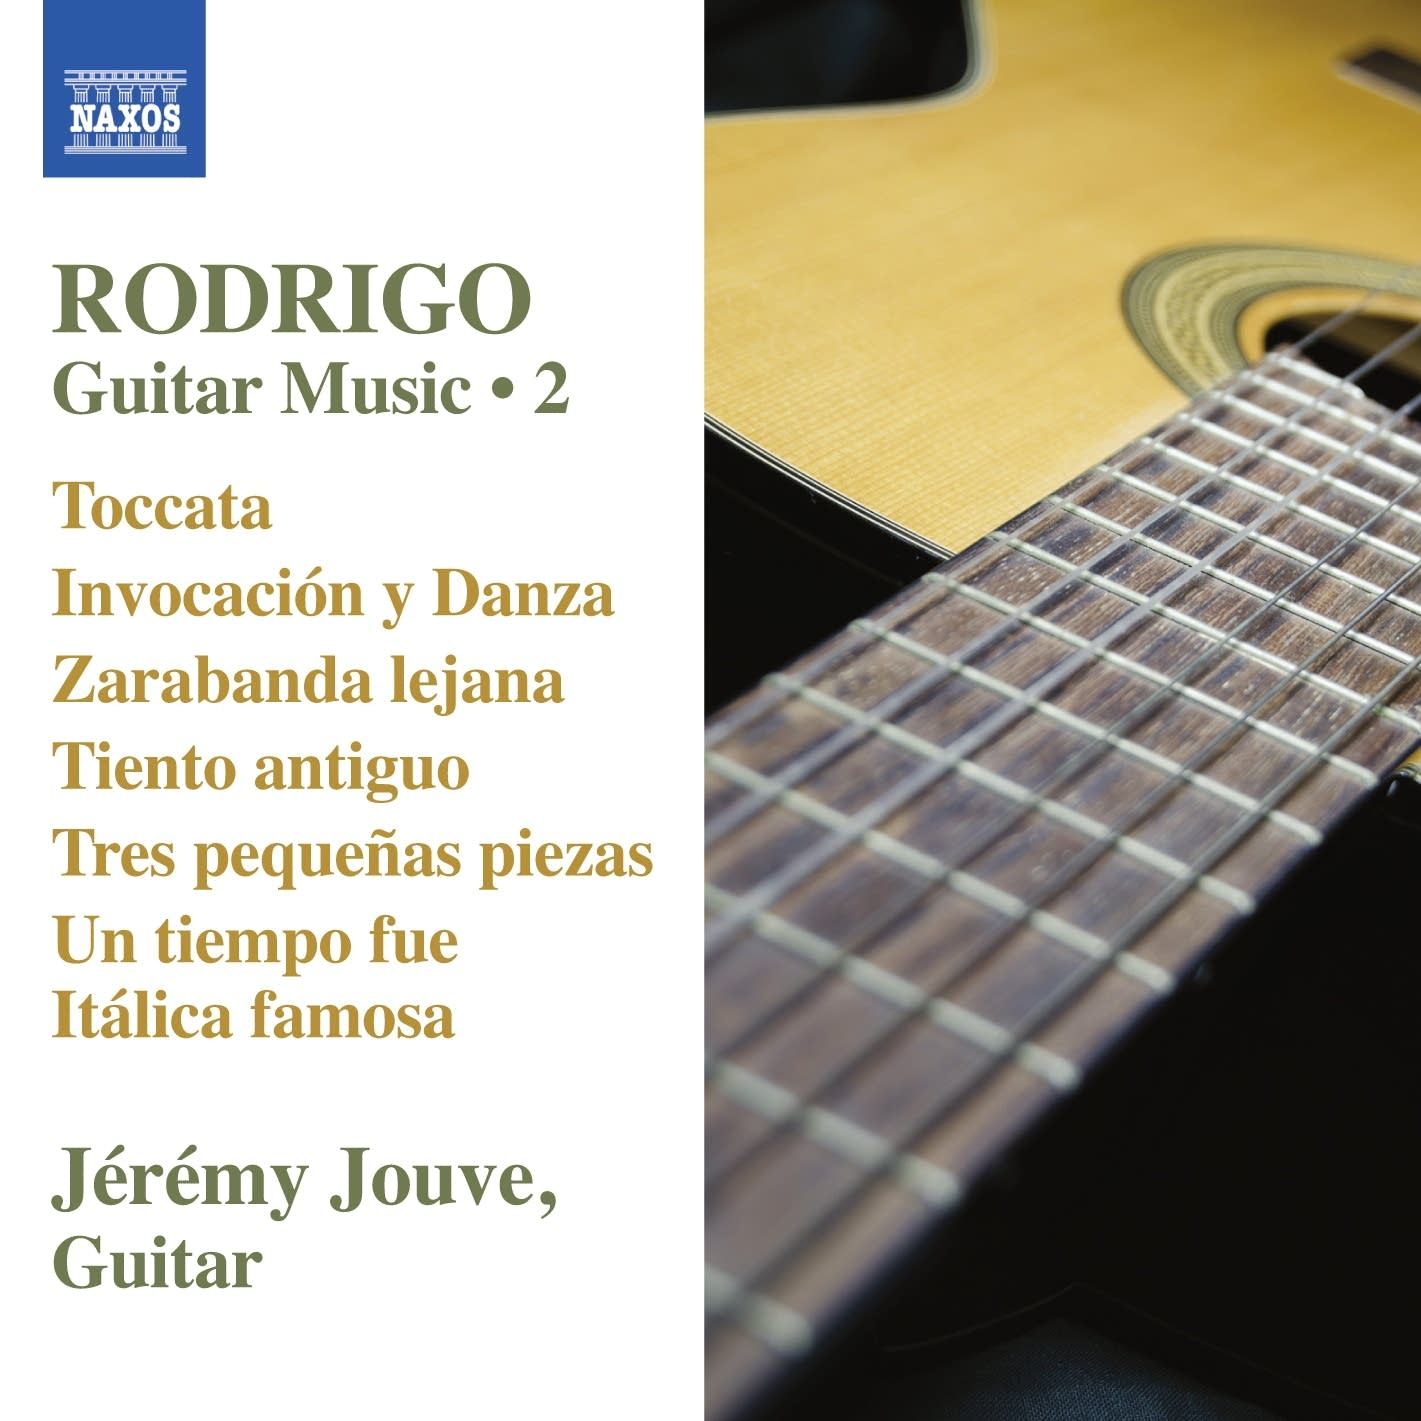 Joaquin Rodrigo - Un Tiempo fue Italica Famosa